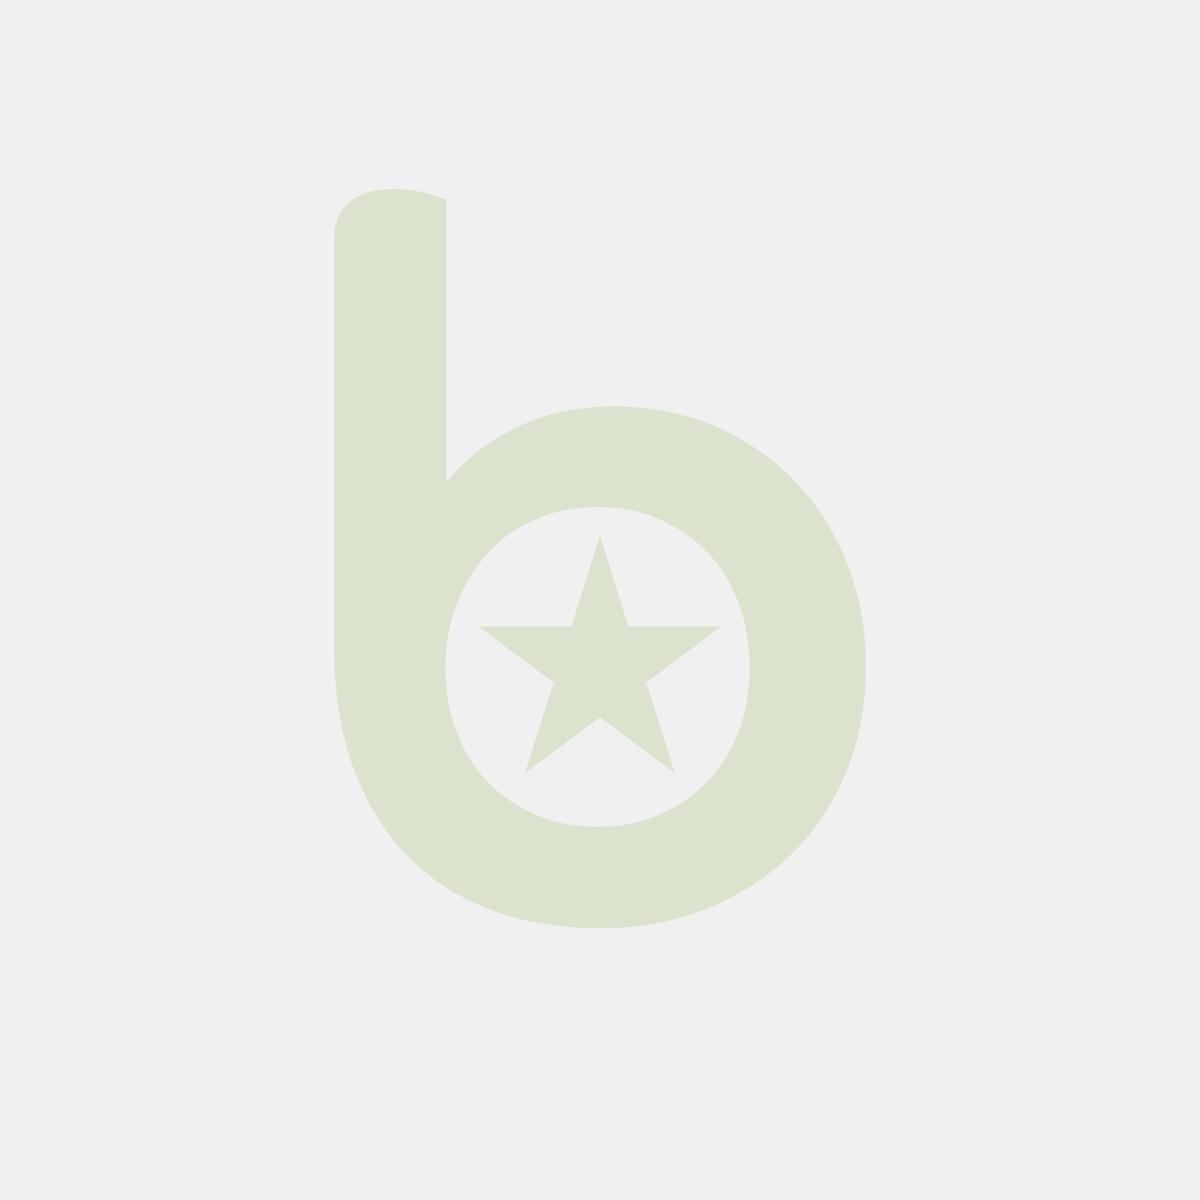 FINGERFOOD - pucharek SAKE 80ml transparentny fi.6,9xh.3,5cm op. 50 sztuk